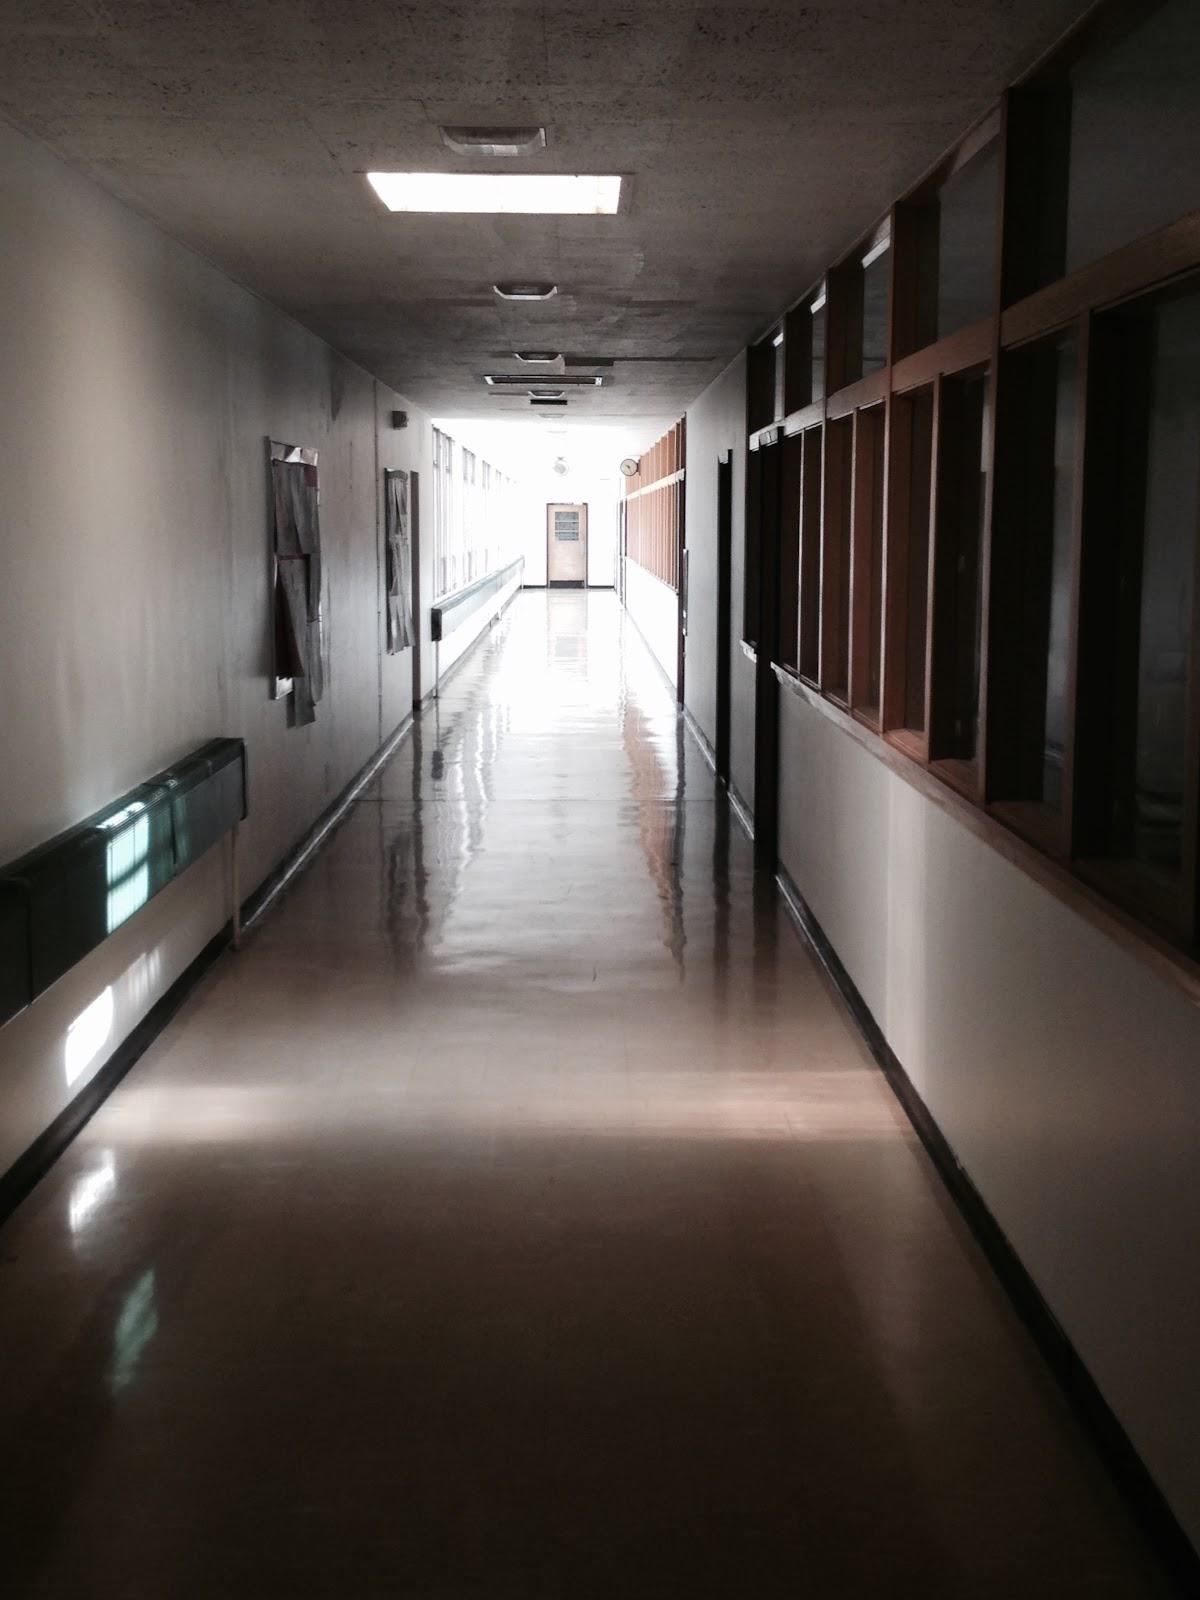 File:Dark Hallway.jpg